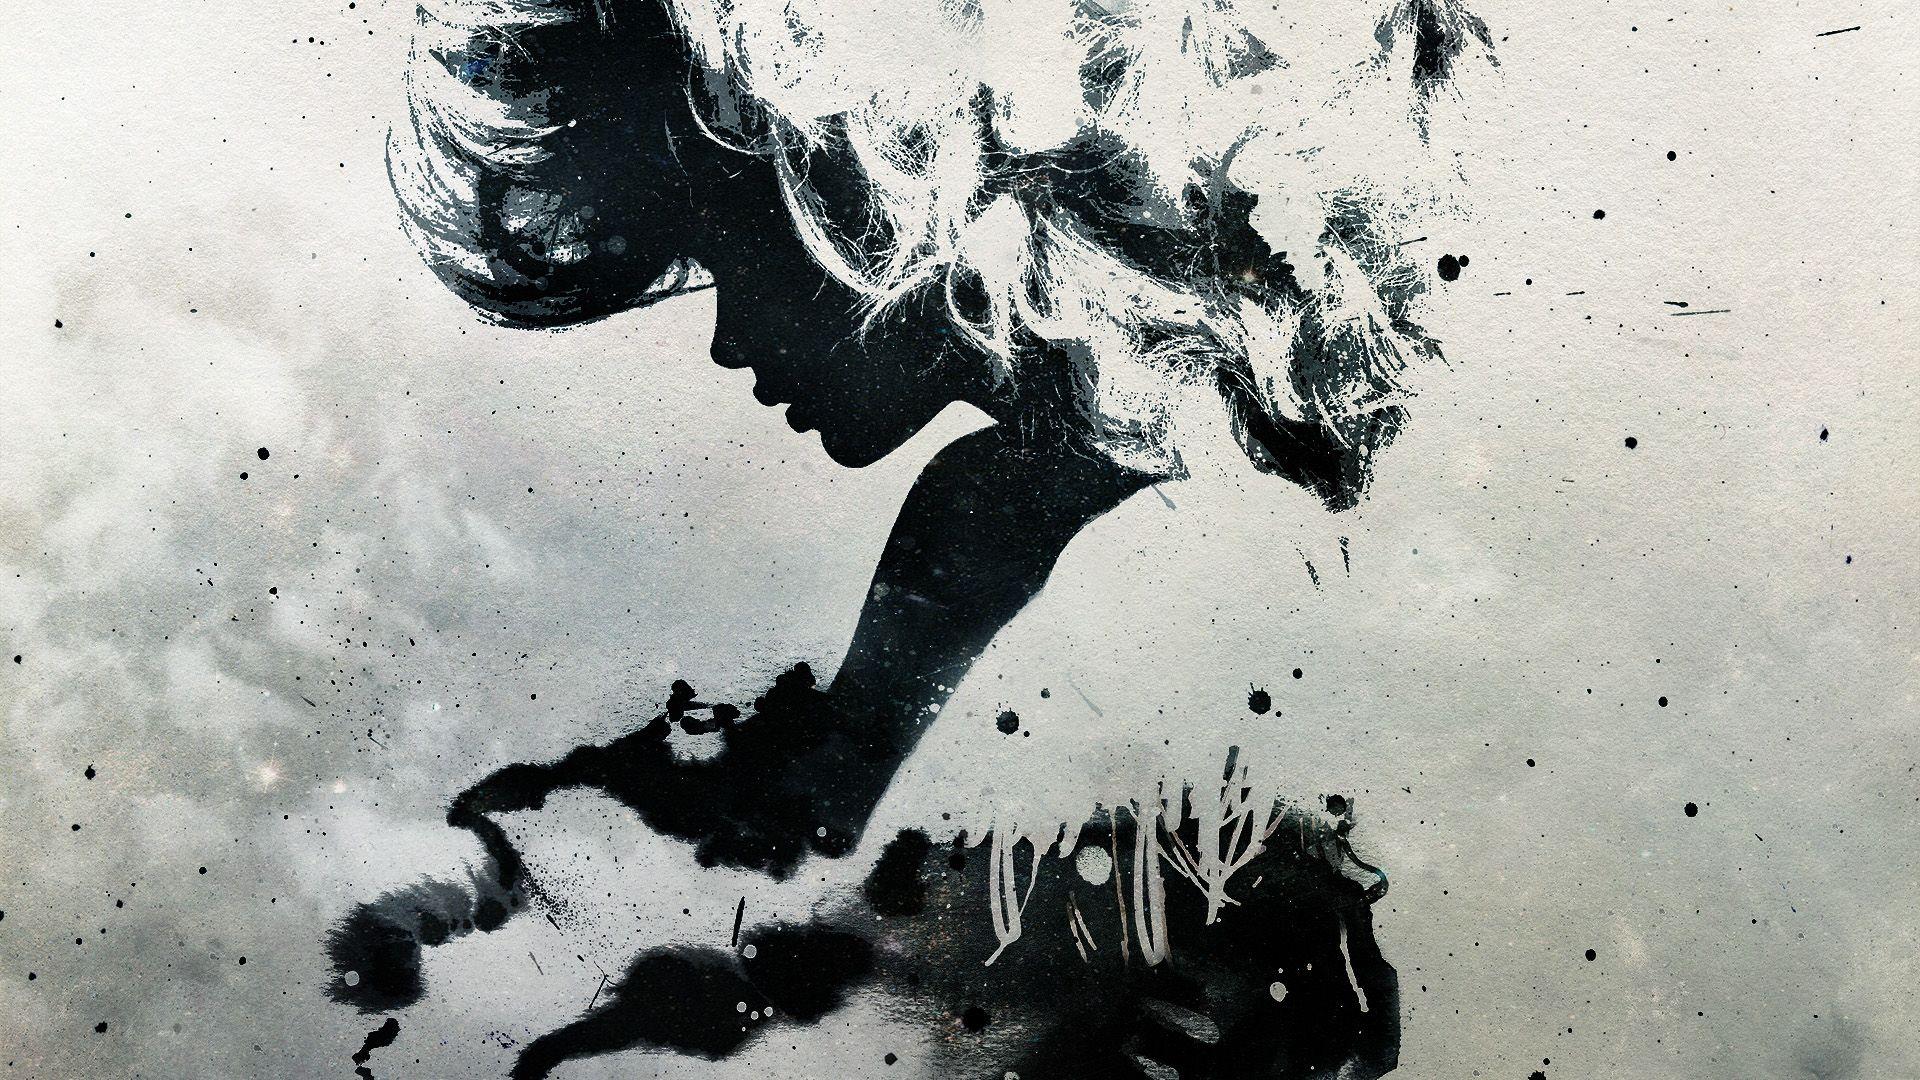 Women Abstract La Roux Artwork Alex Cherry Desktop Wallpaper | art ...